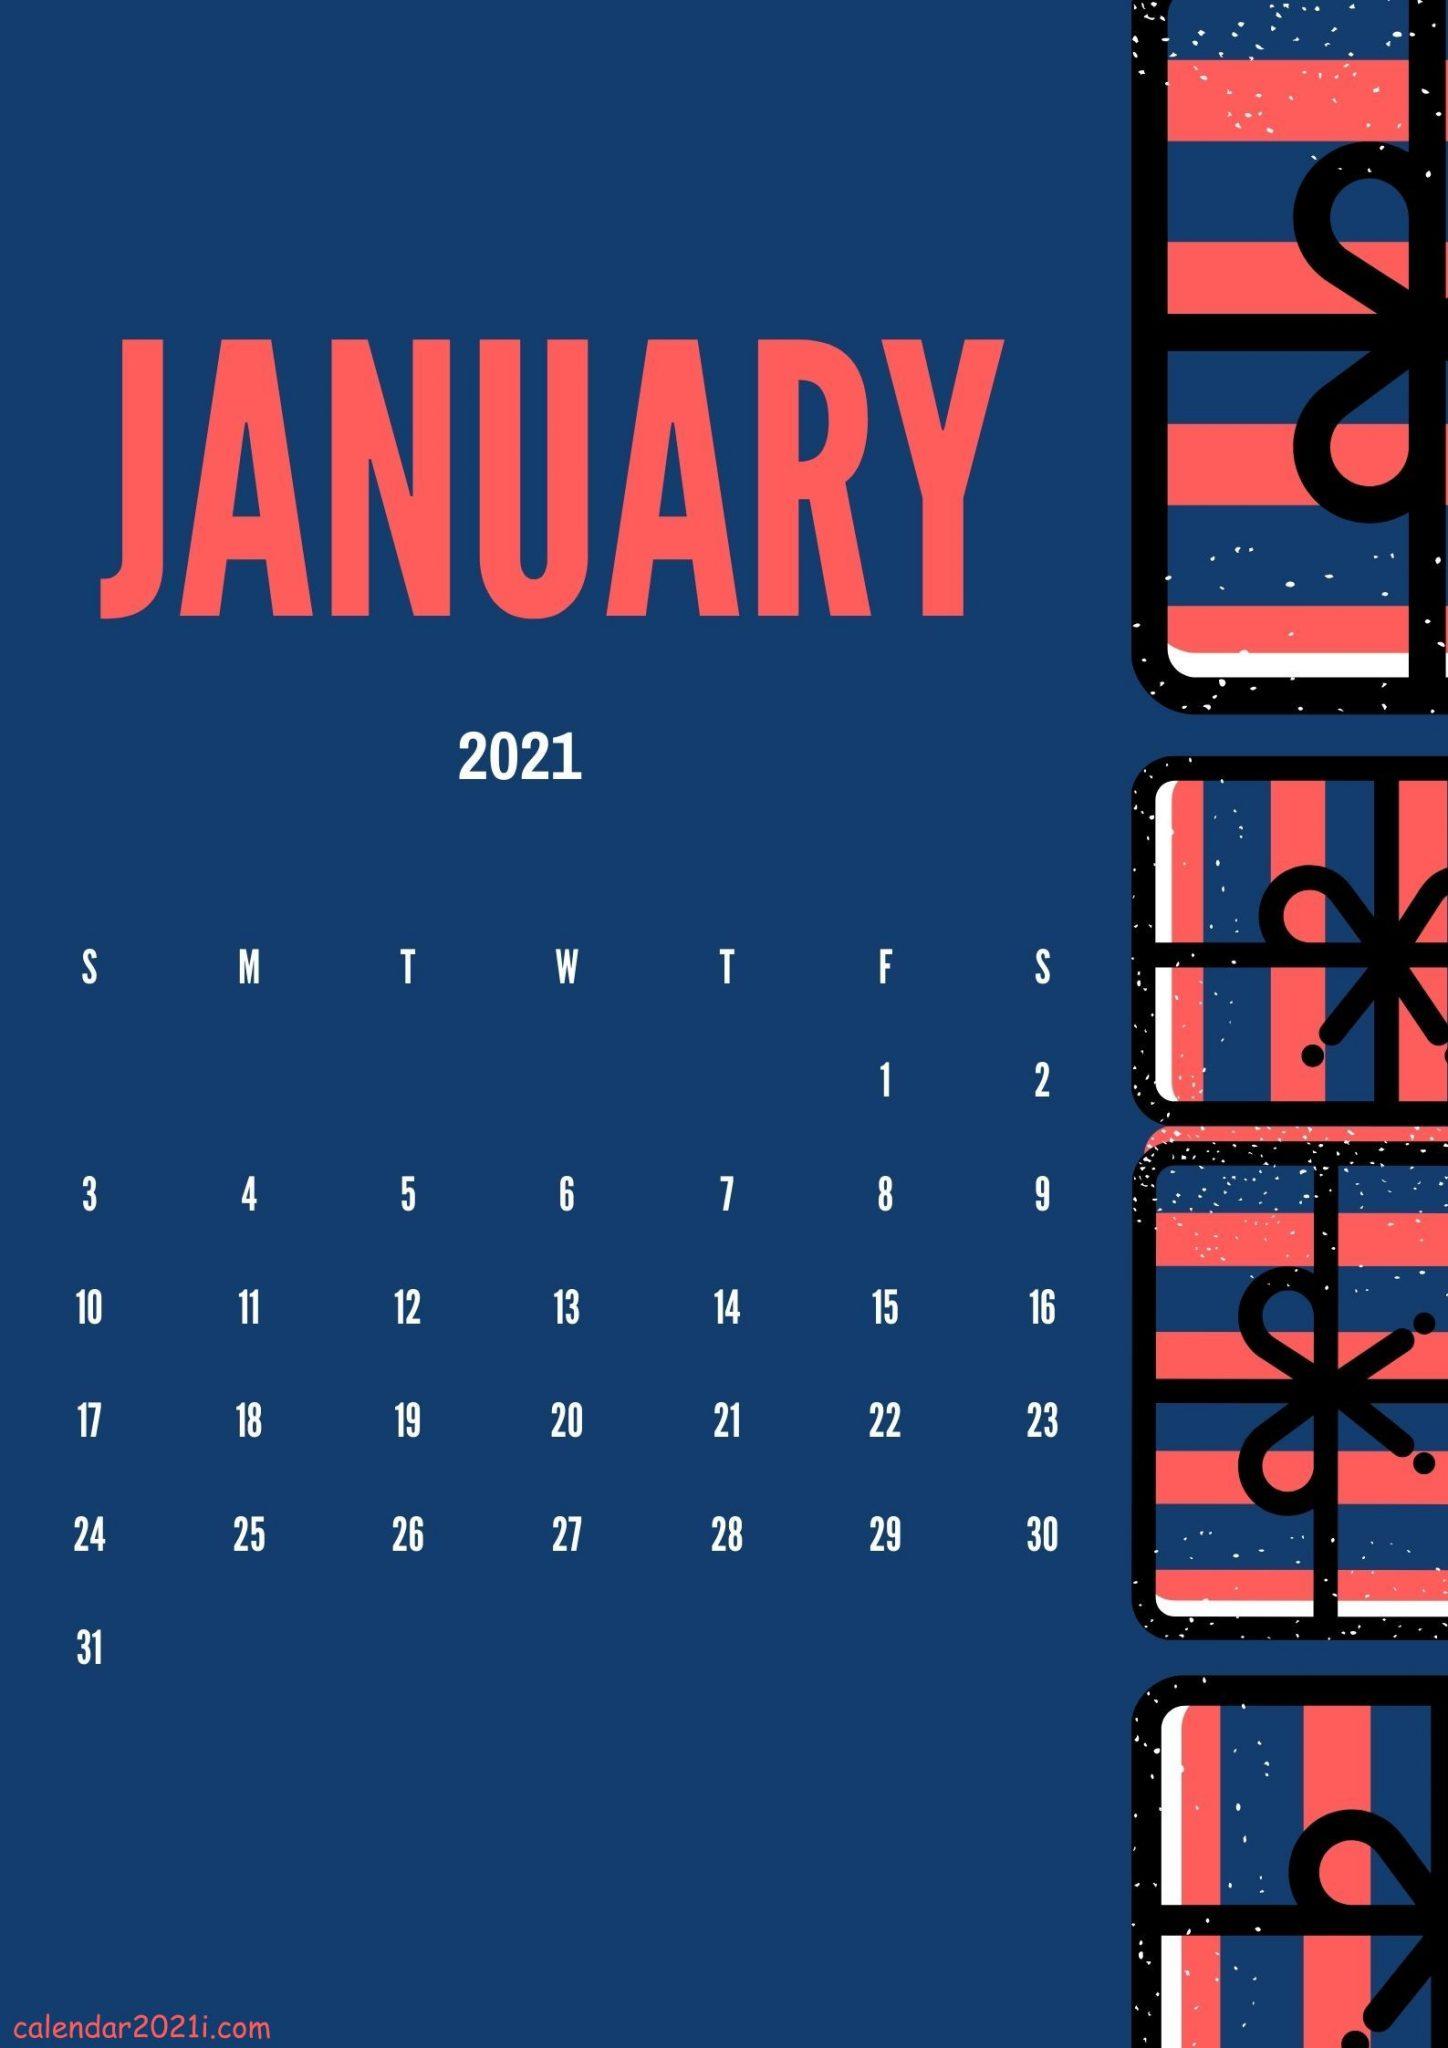 January 2021 Calendar Design